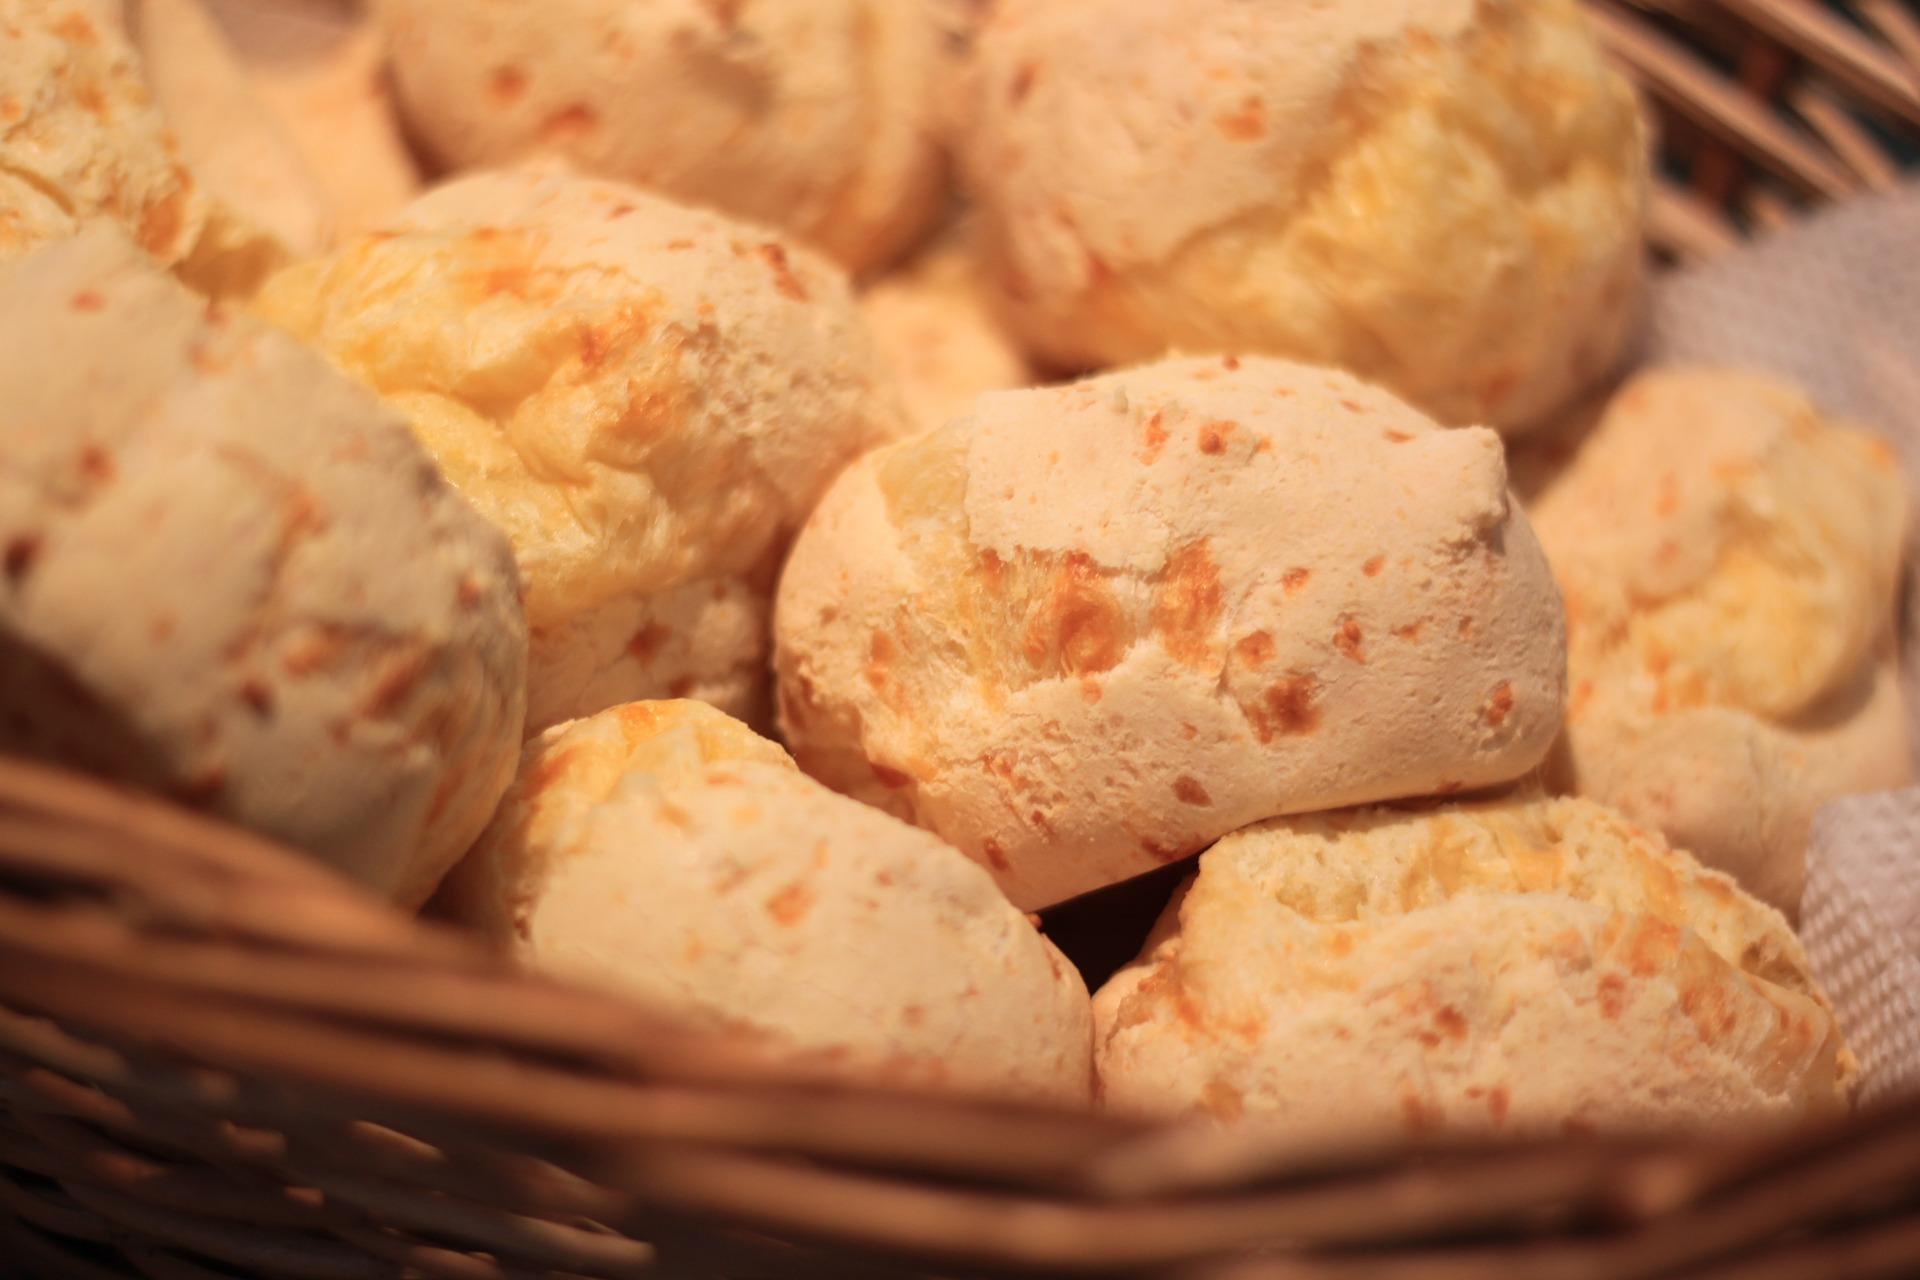 cheese-bread-2577183_1920.jpg